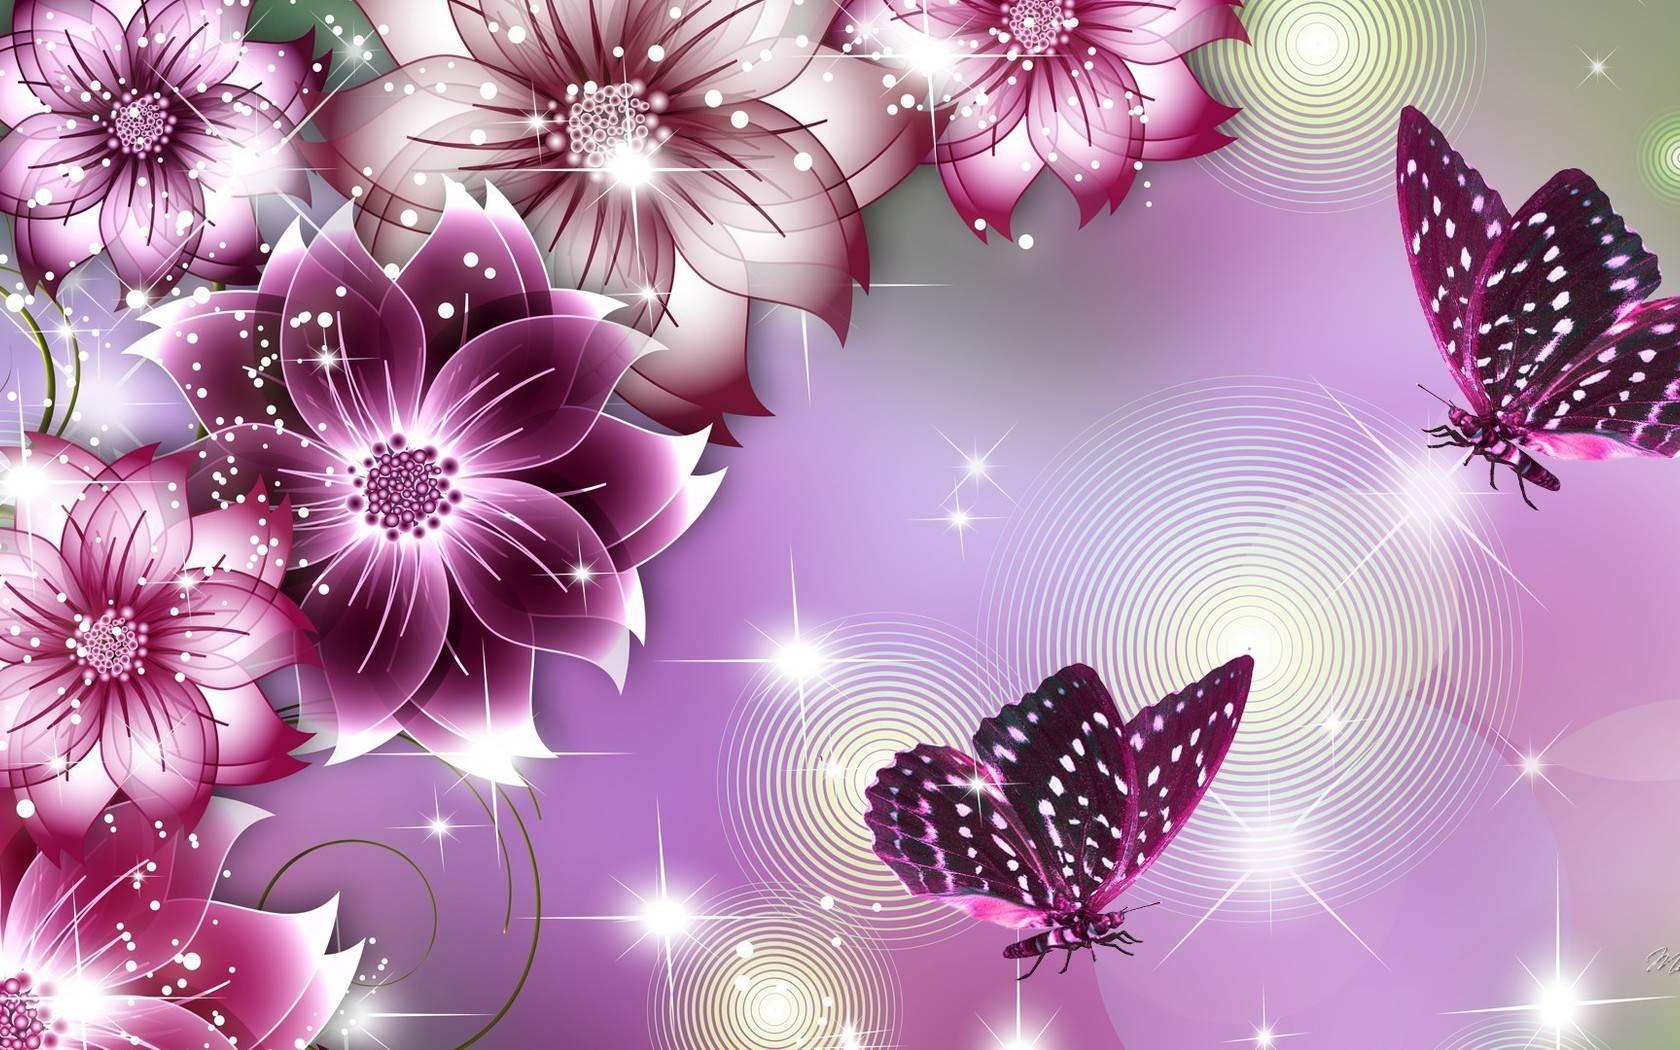 Butterfly Wallpaper Wallpapers Backgrounds Desktop 1680x1050 1680x1050